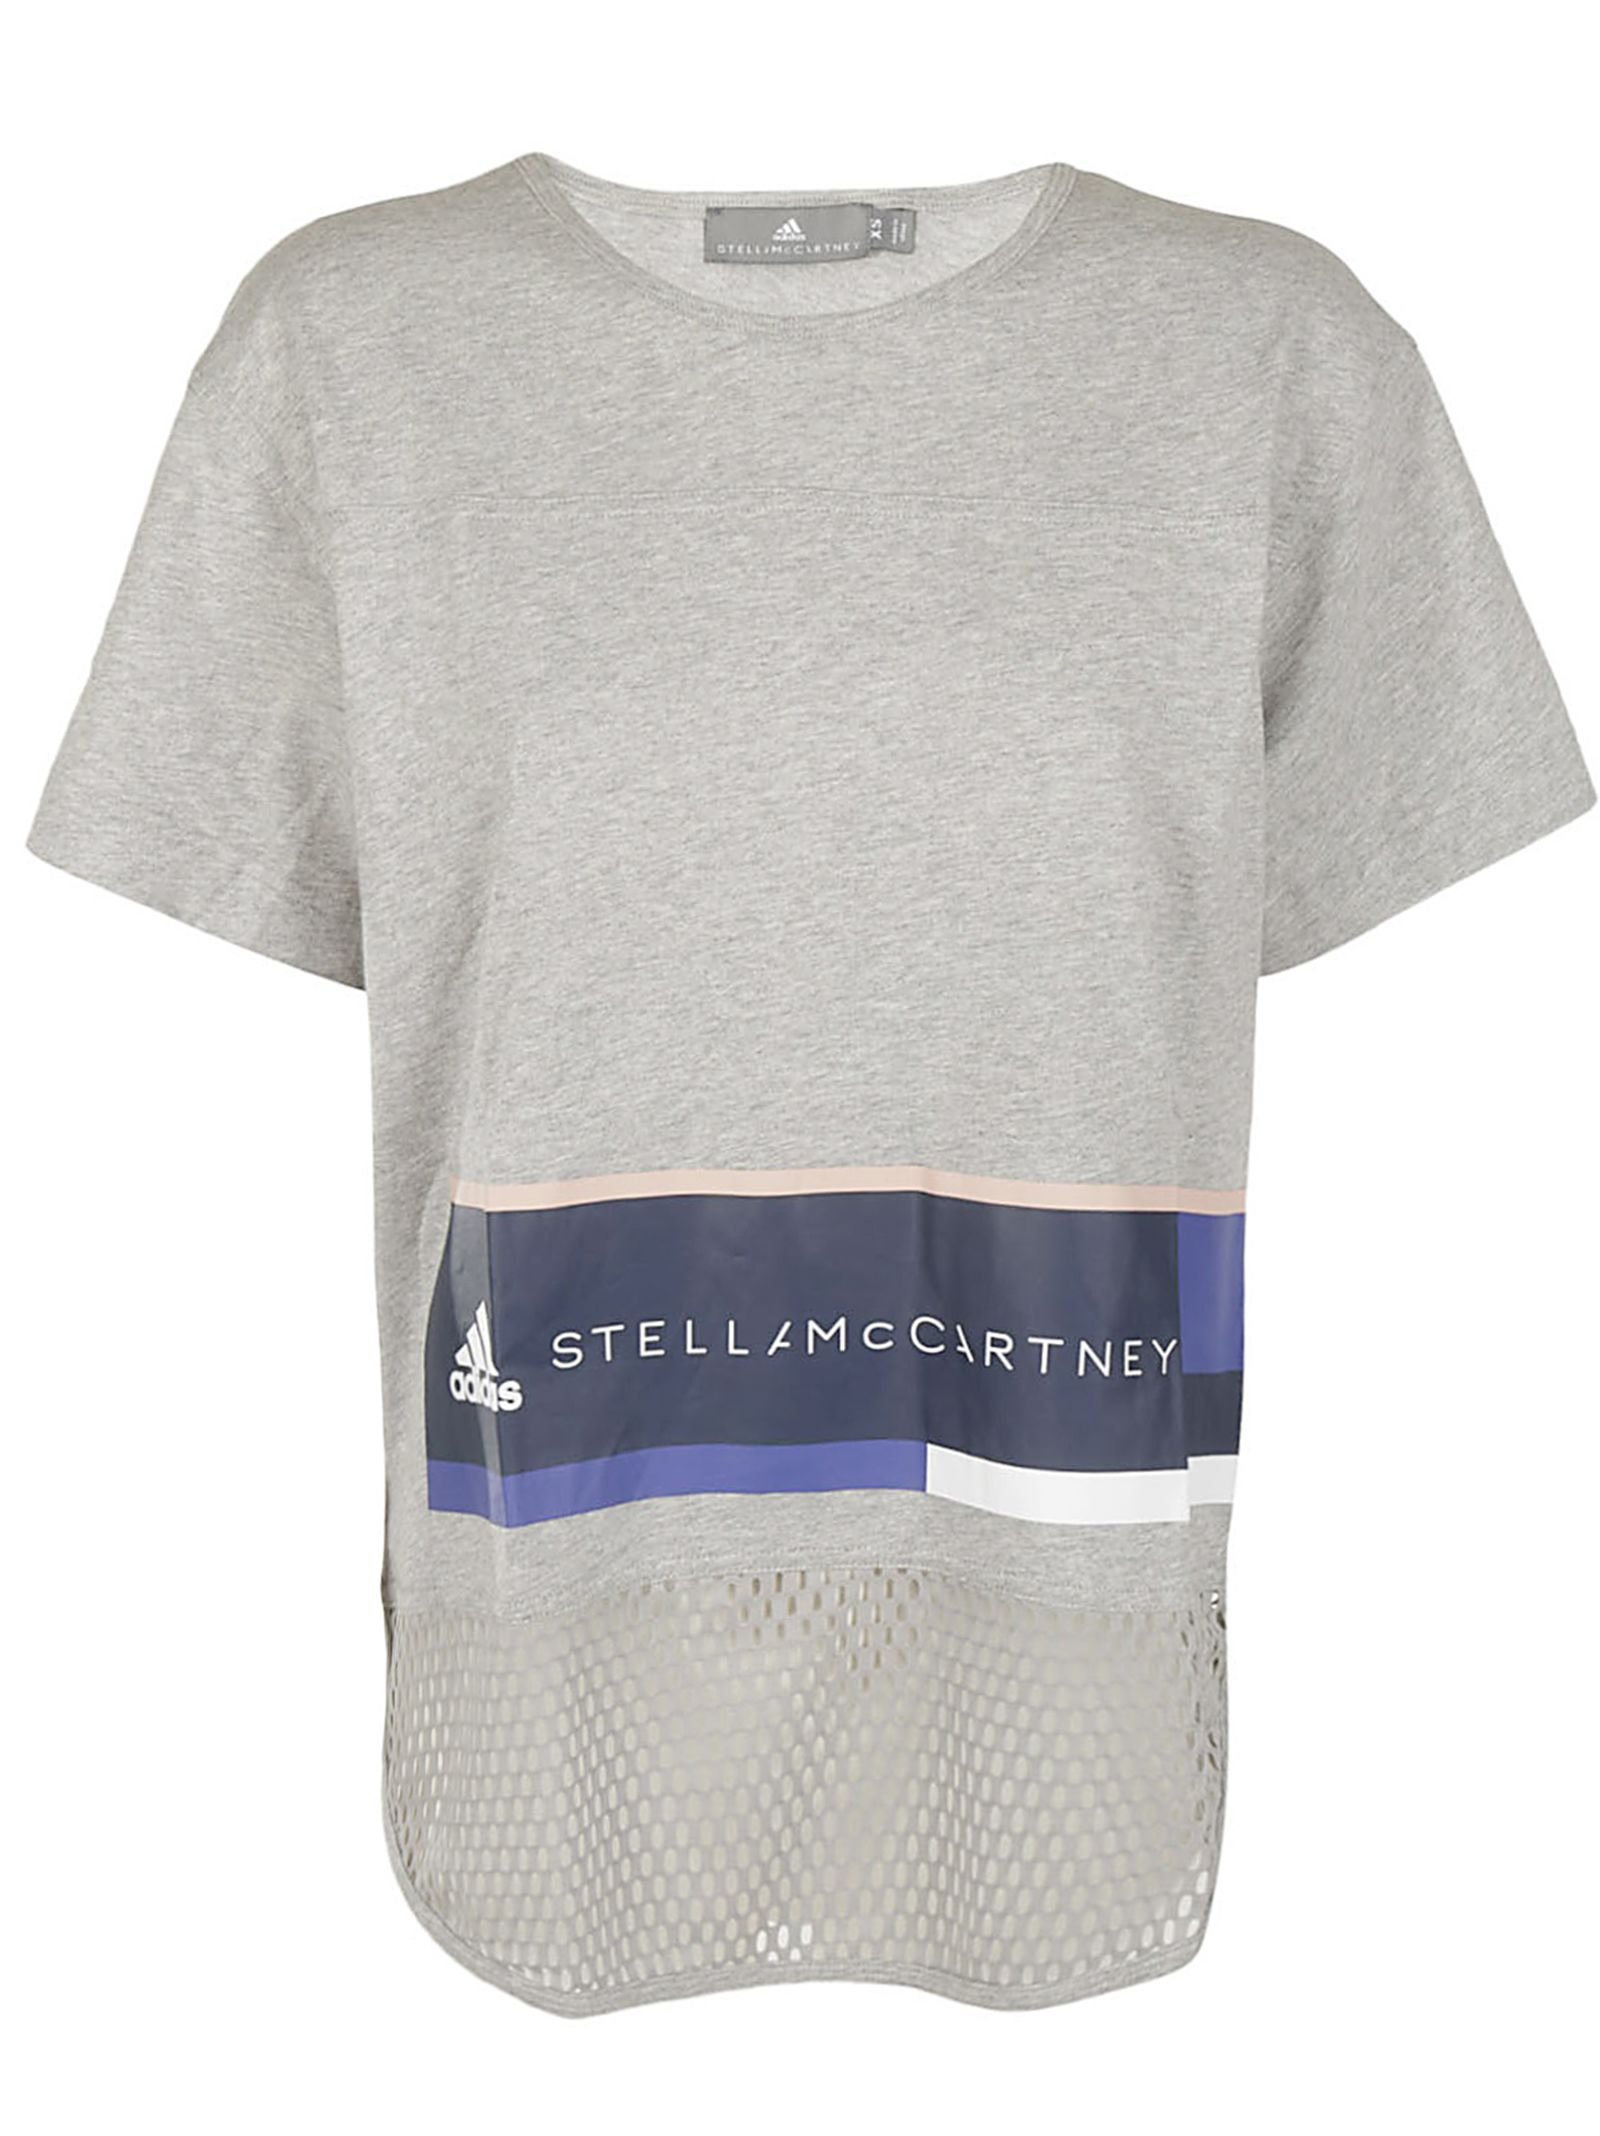 Top for Women On Sale, Adidas X Stella Mccartney, White, Organic Cotton, 2017, 8 Stella McCartney